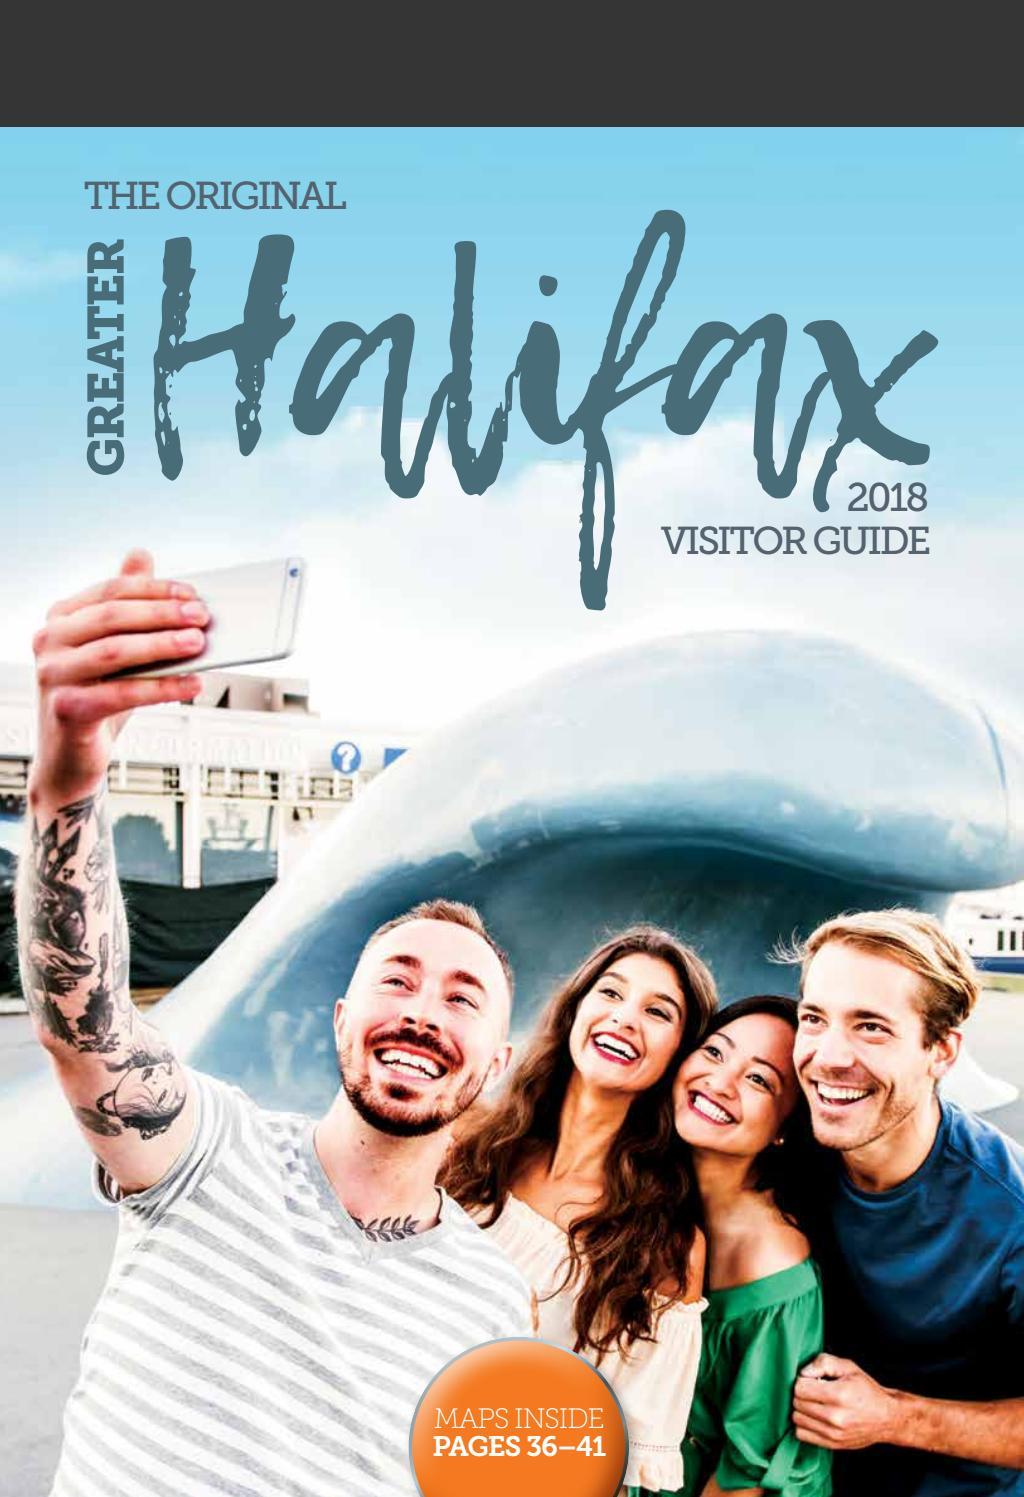 Halifax Speed Dating 2016